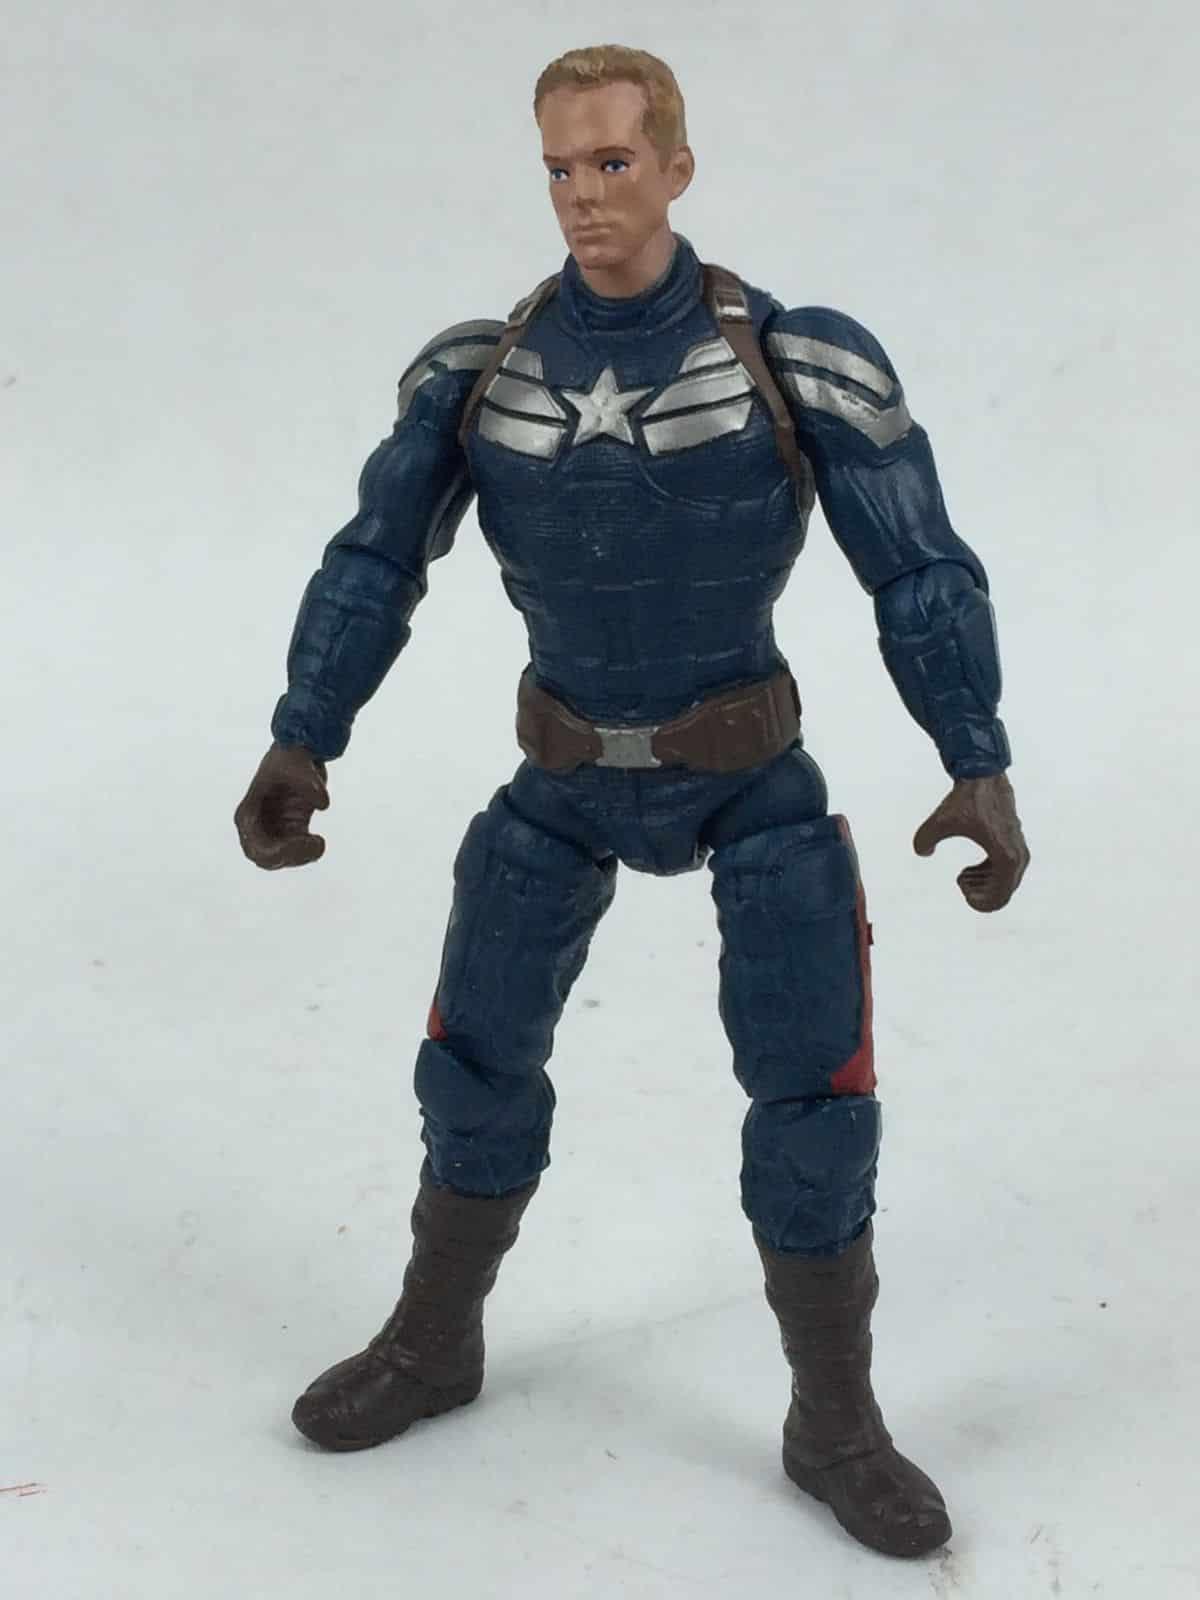 Captain-America-Winter-Soldier-Captain-America-Figure